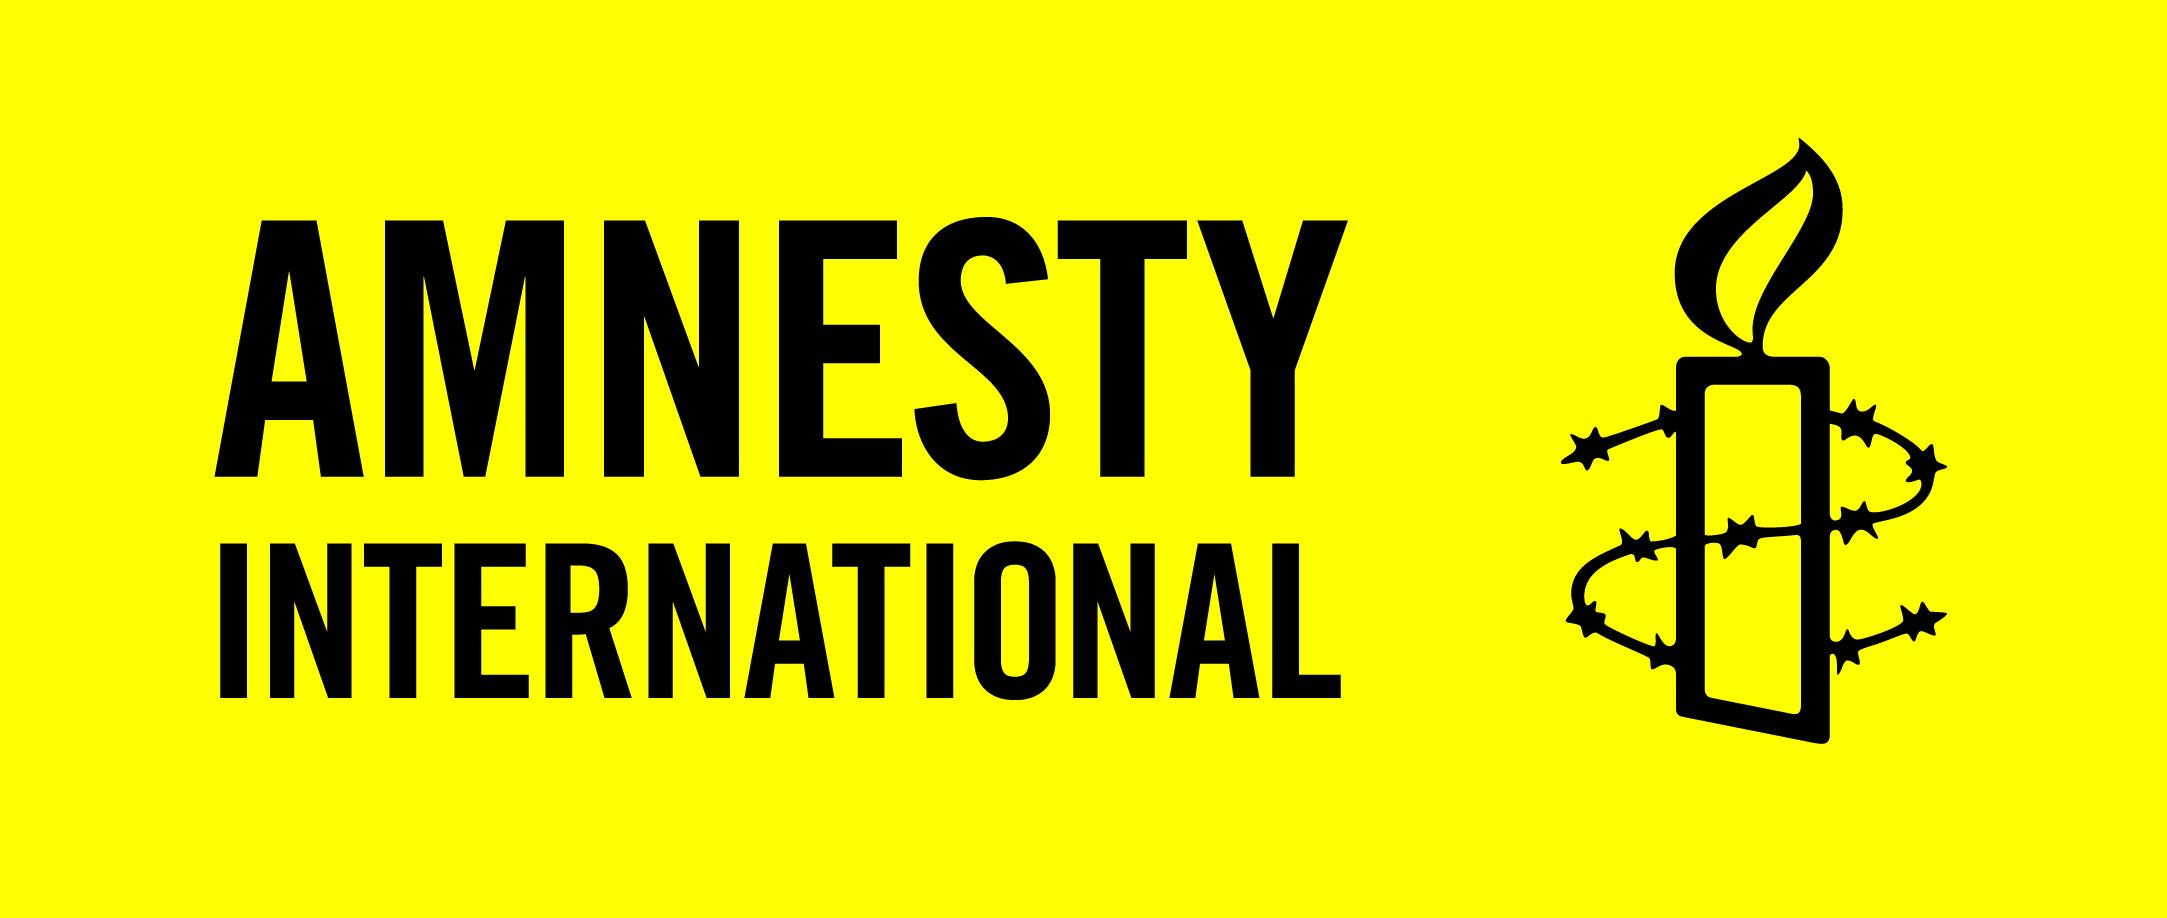 Amnesty International PNG - 29380